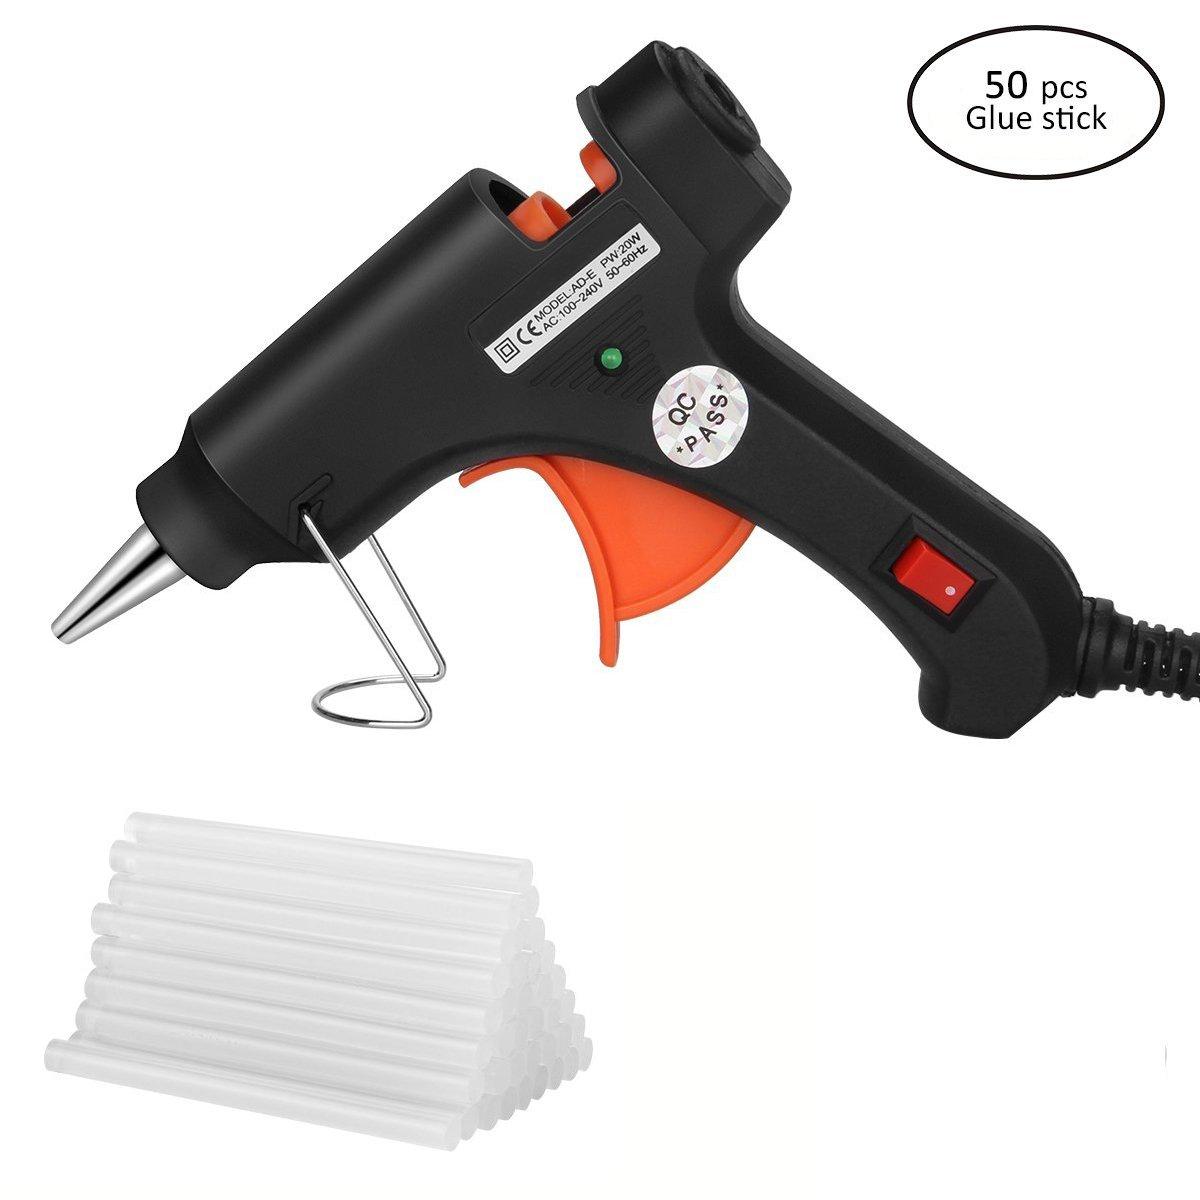 Hltd Hot Glue Gun,20 Watt High Temperature Hot Melt Glue Gun with 50pcs Glue Sticks Flexible Trigger for DIY Arts,Craft Projects &Sealing Finger Caps(Black)